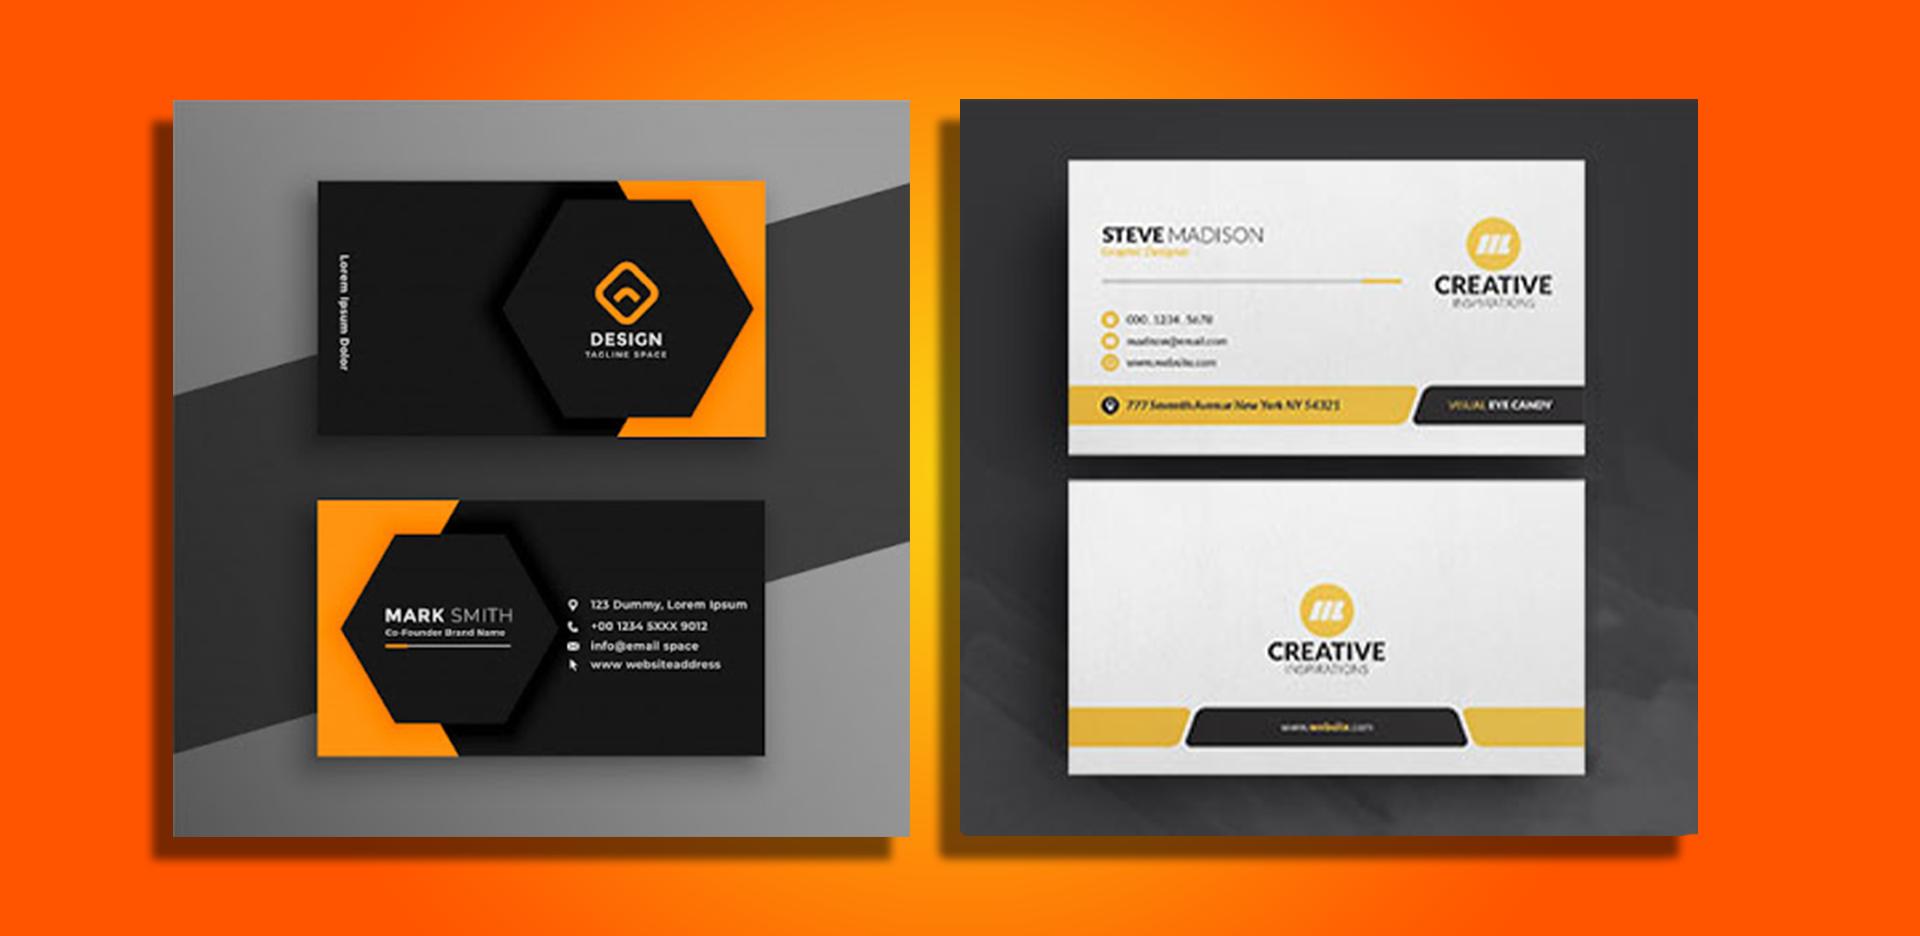 Professional & Unique Business Card Design For Your Business